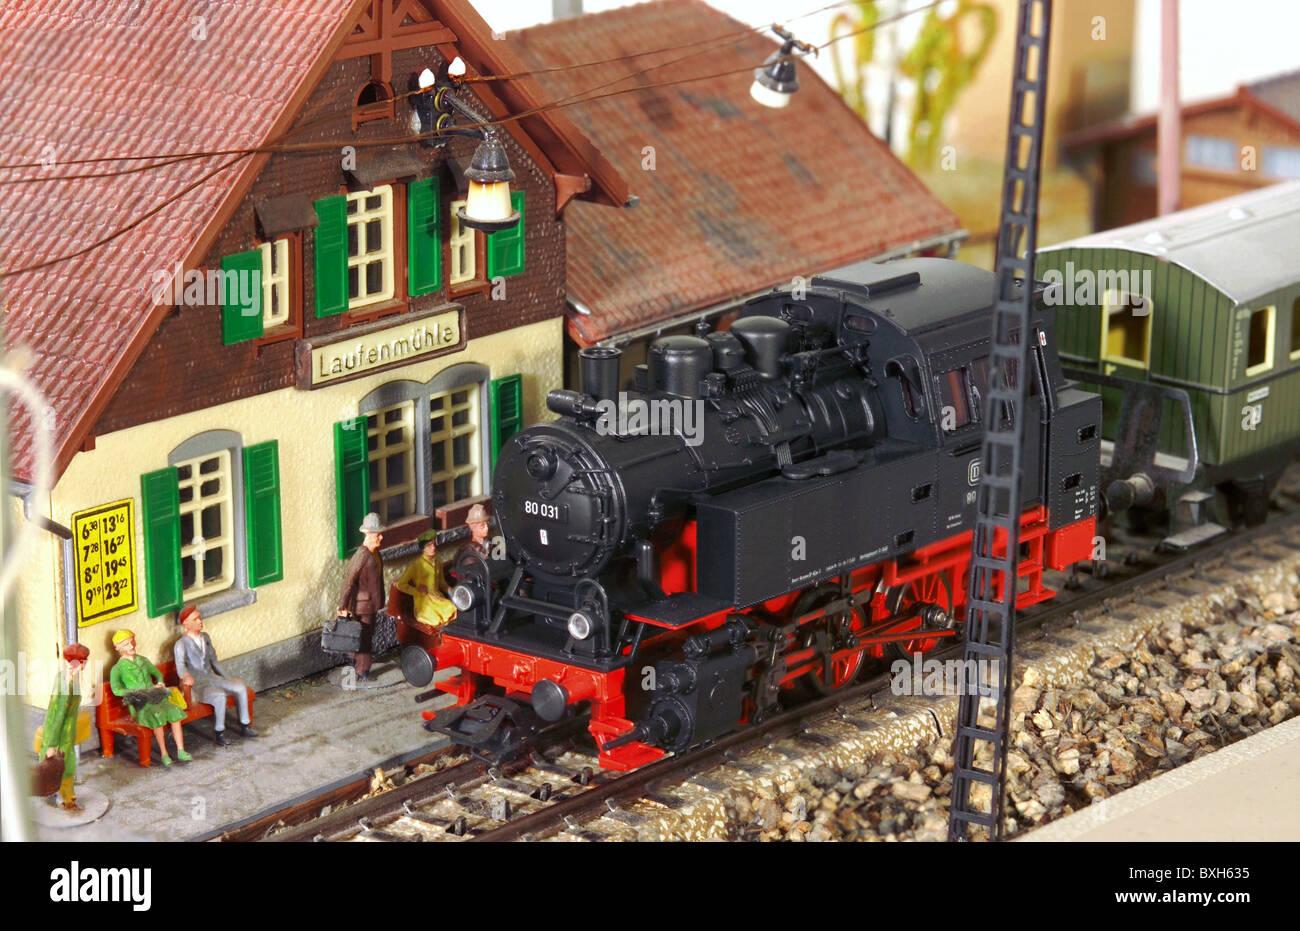 Spielzeug modell eisenbahn märklin bahnhof ankunft